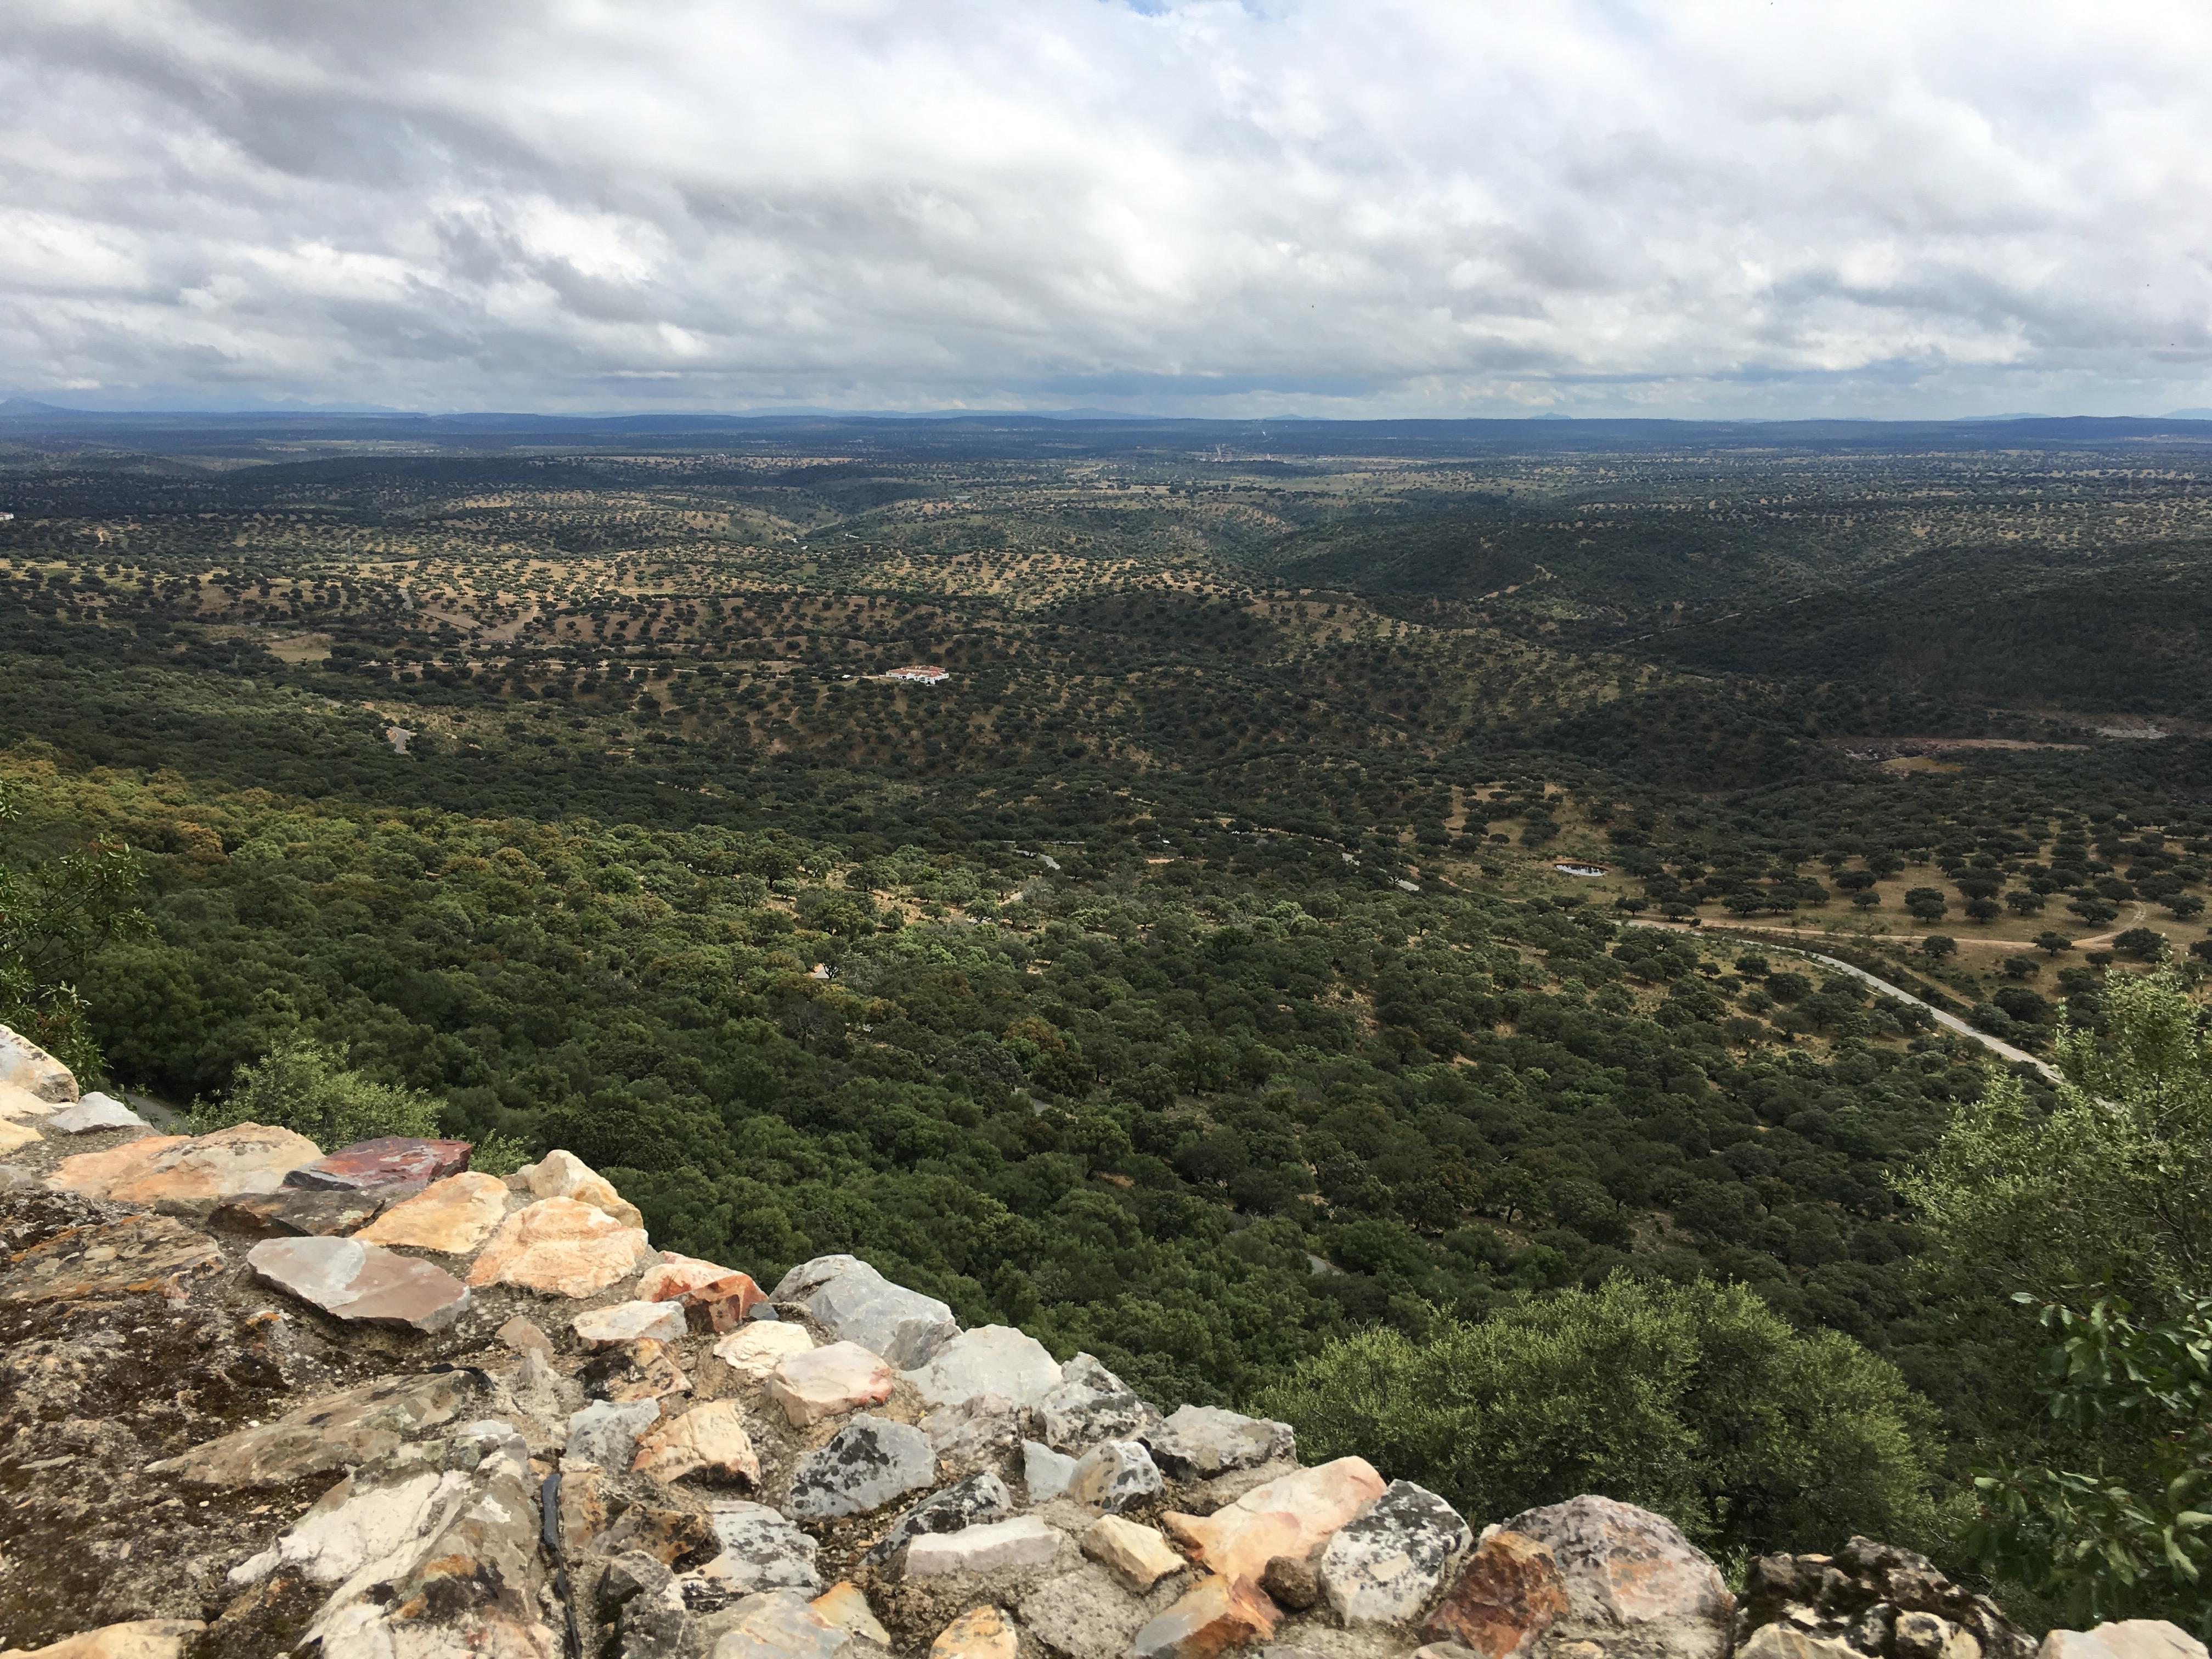 2017 04 Extremadura Andy's photos